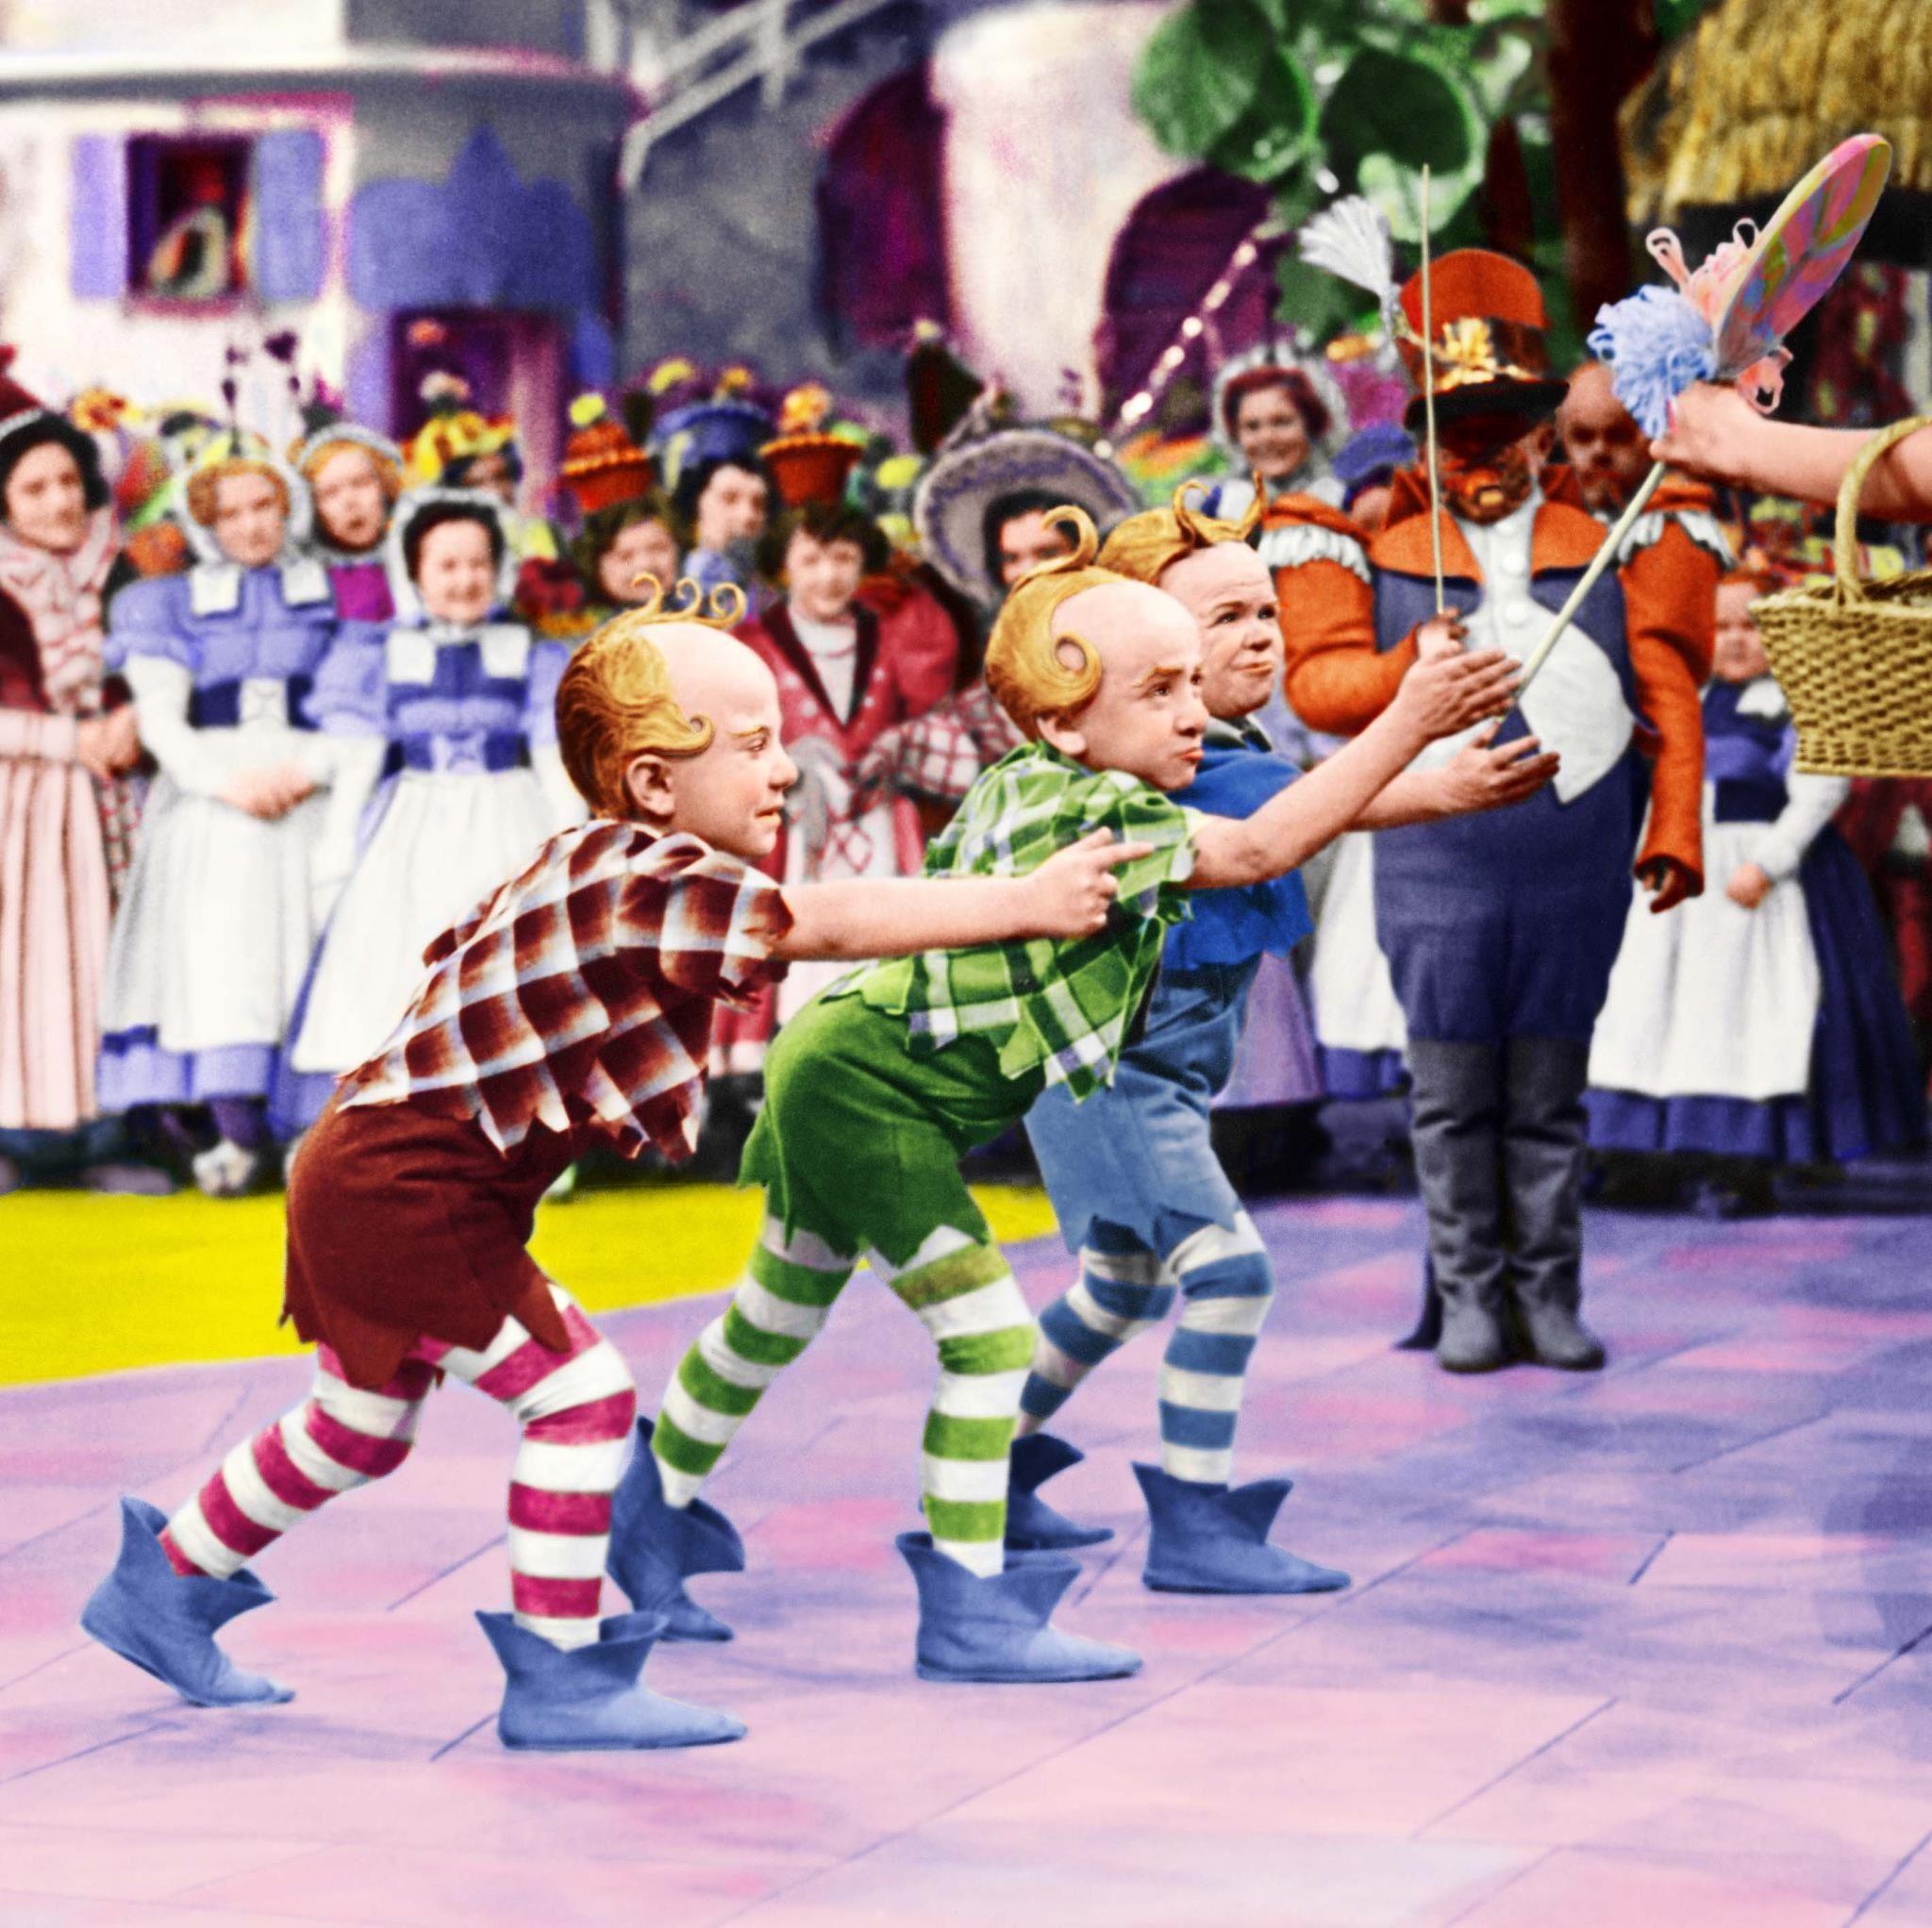 THE MUNCHKINS ~ The Wizard of Oz, 1939 | Fall Fun | Pinterest ...